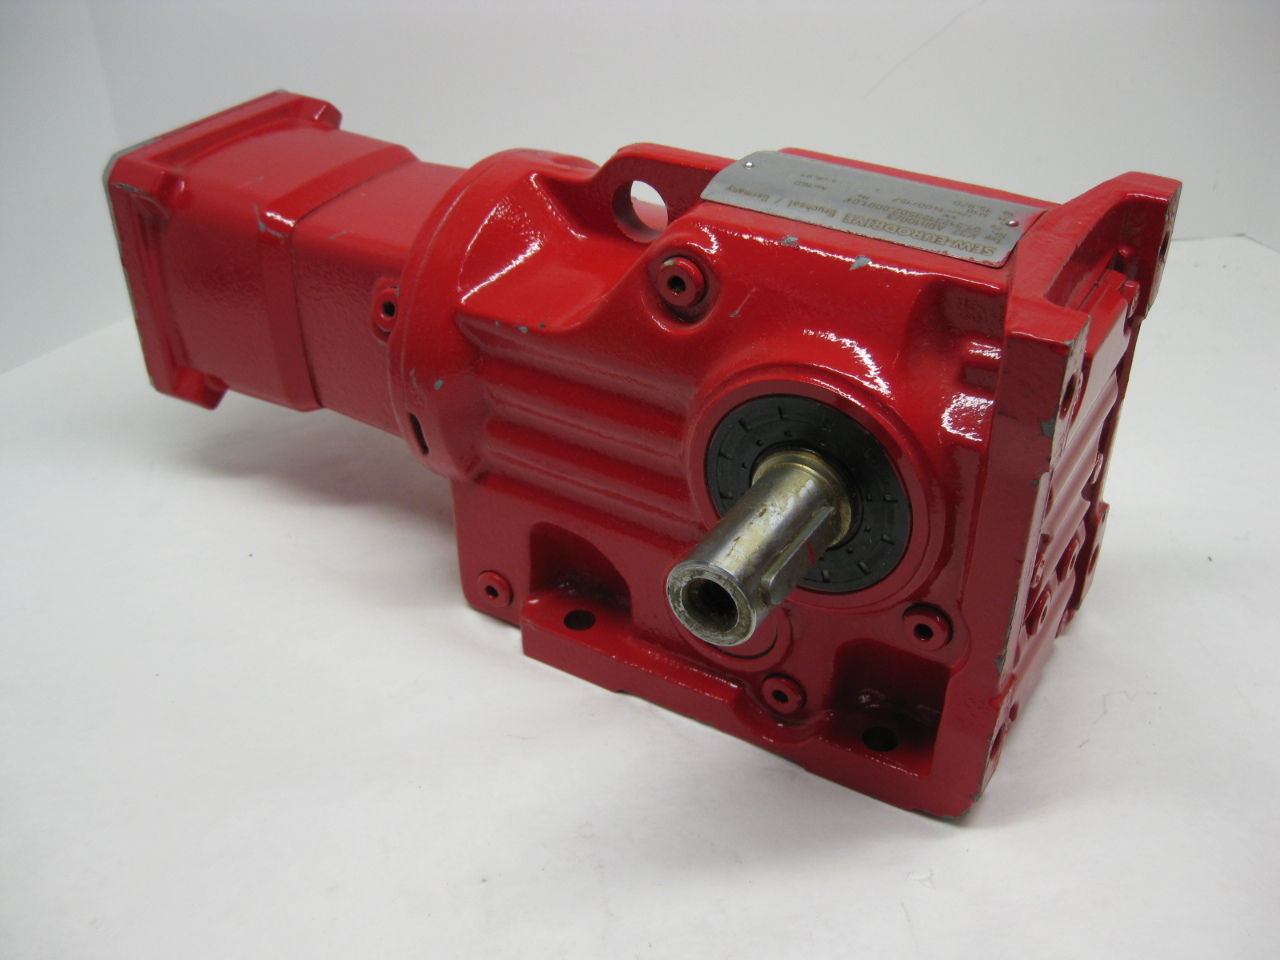 Sew eurodrive k37 aqh100 3 k37 series helical bevel gear for Sew eurodrive gear motor